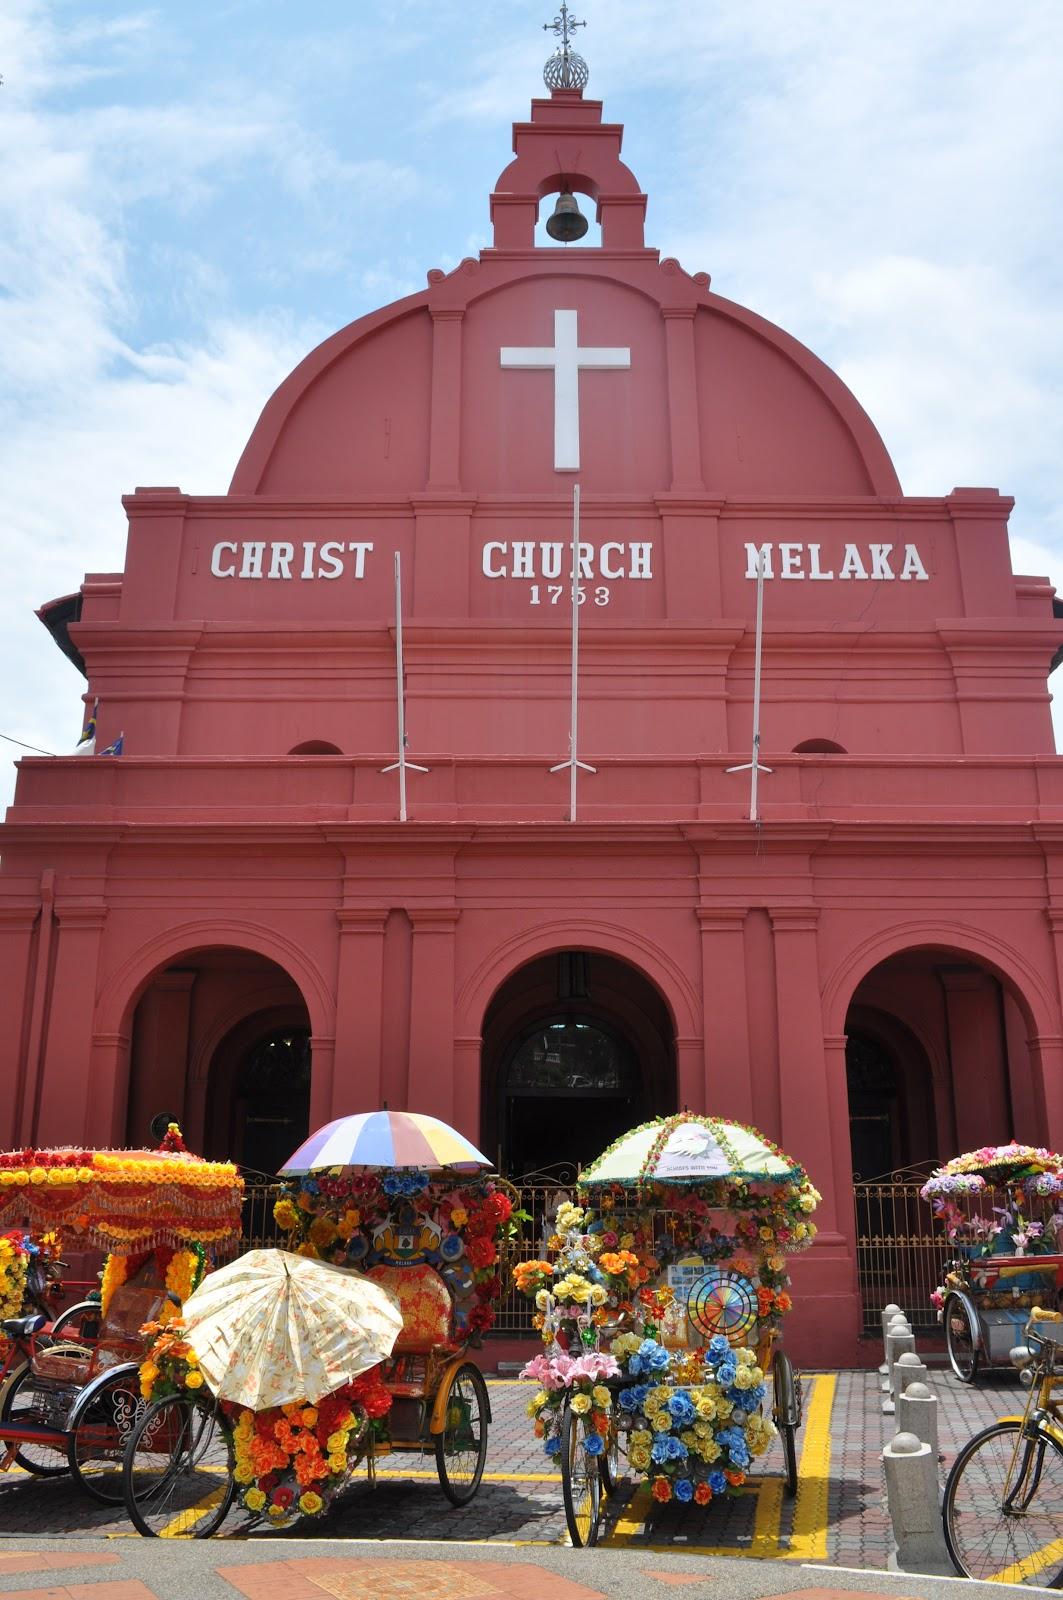 malacca-christ-church-facade-malaysia